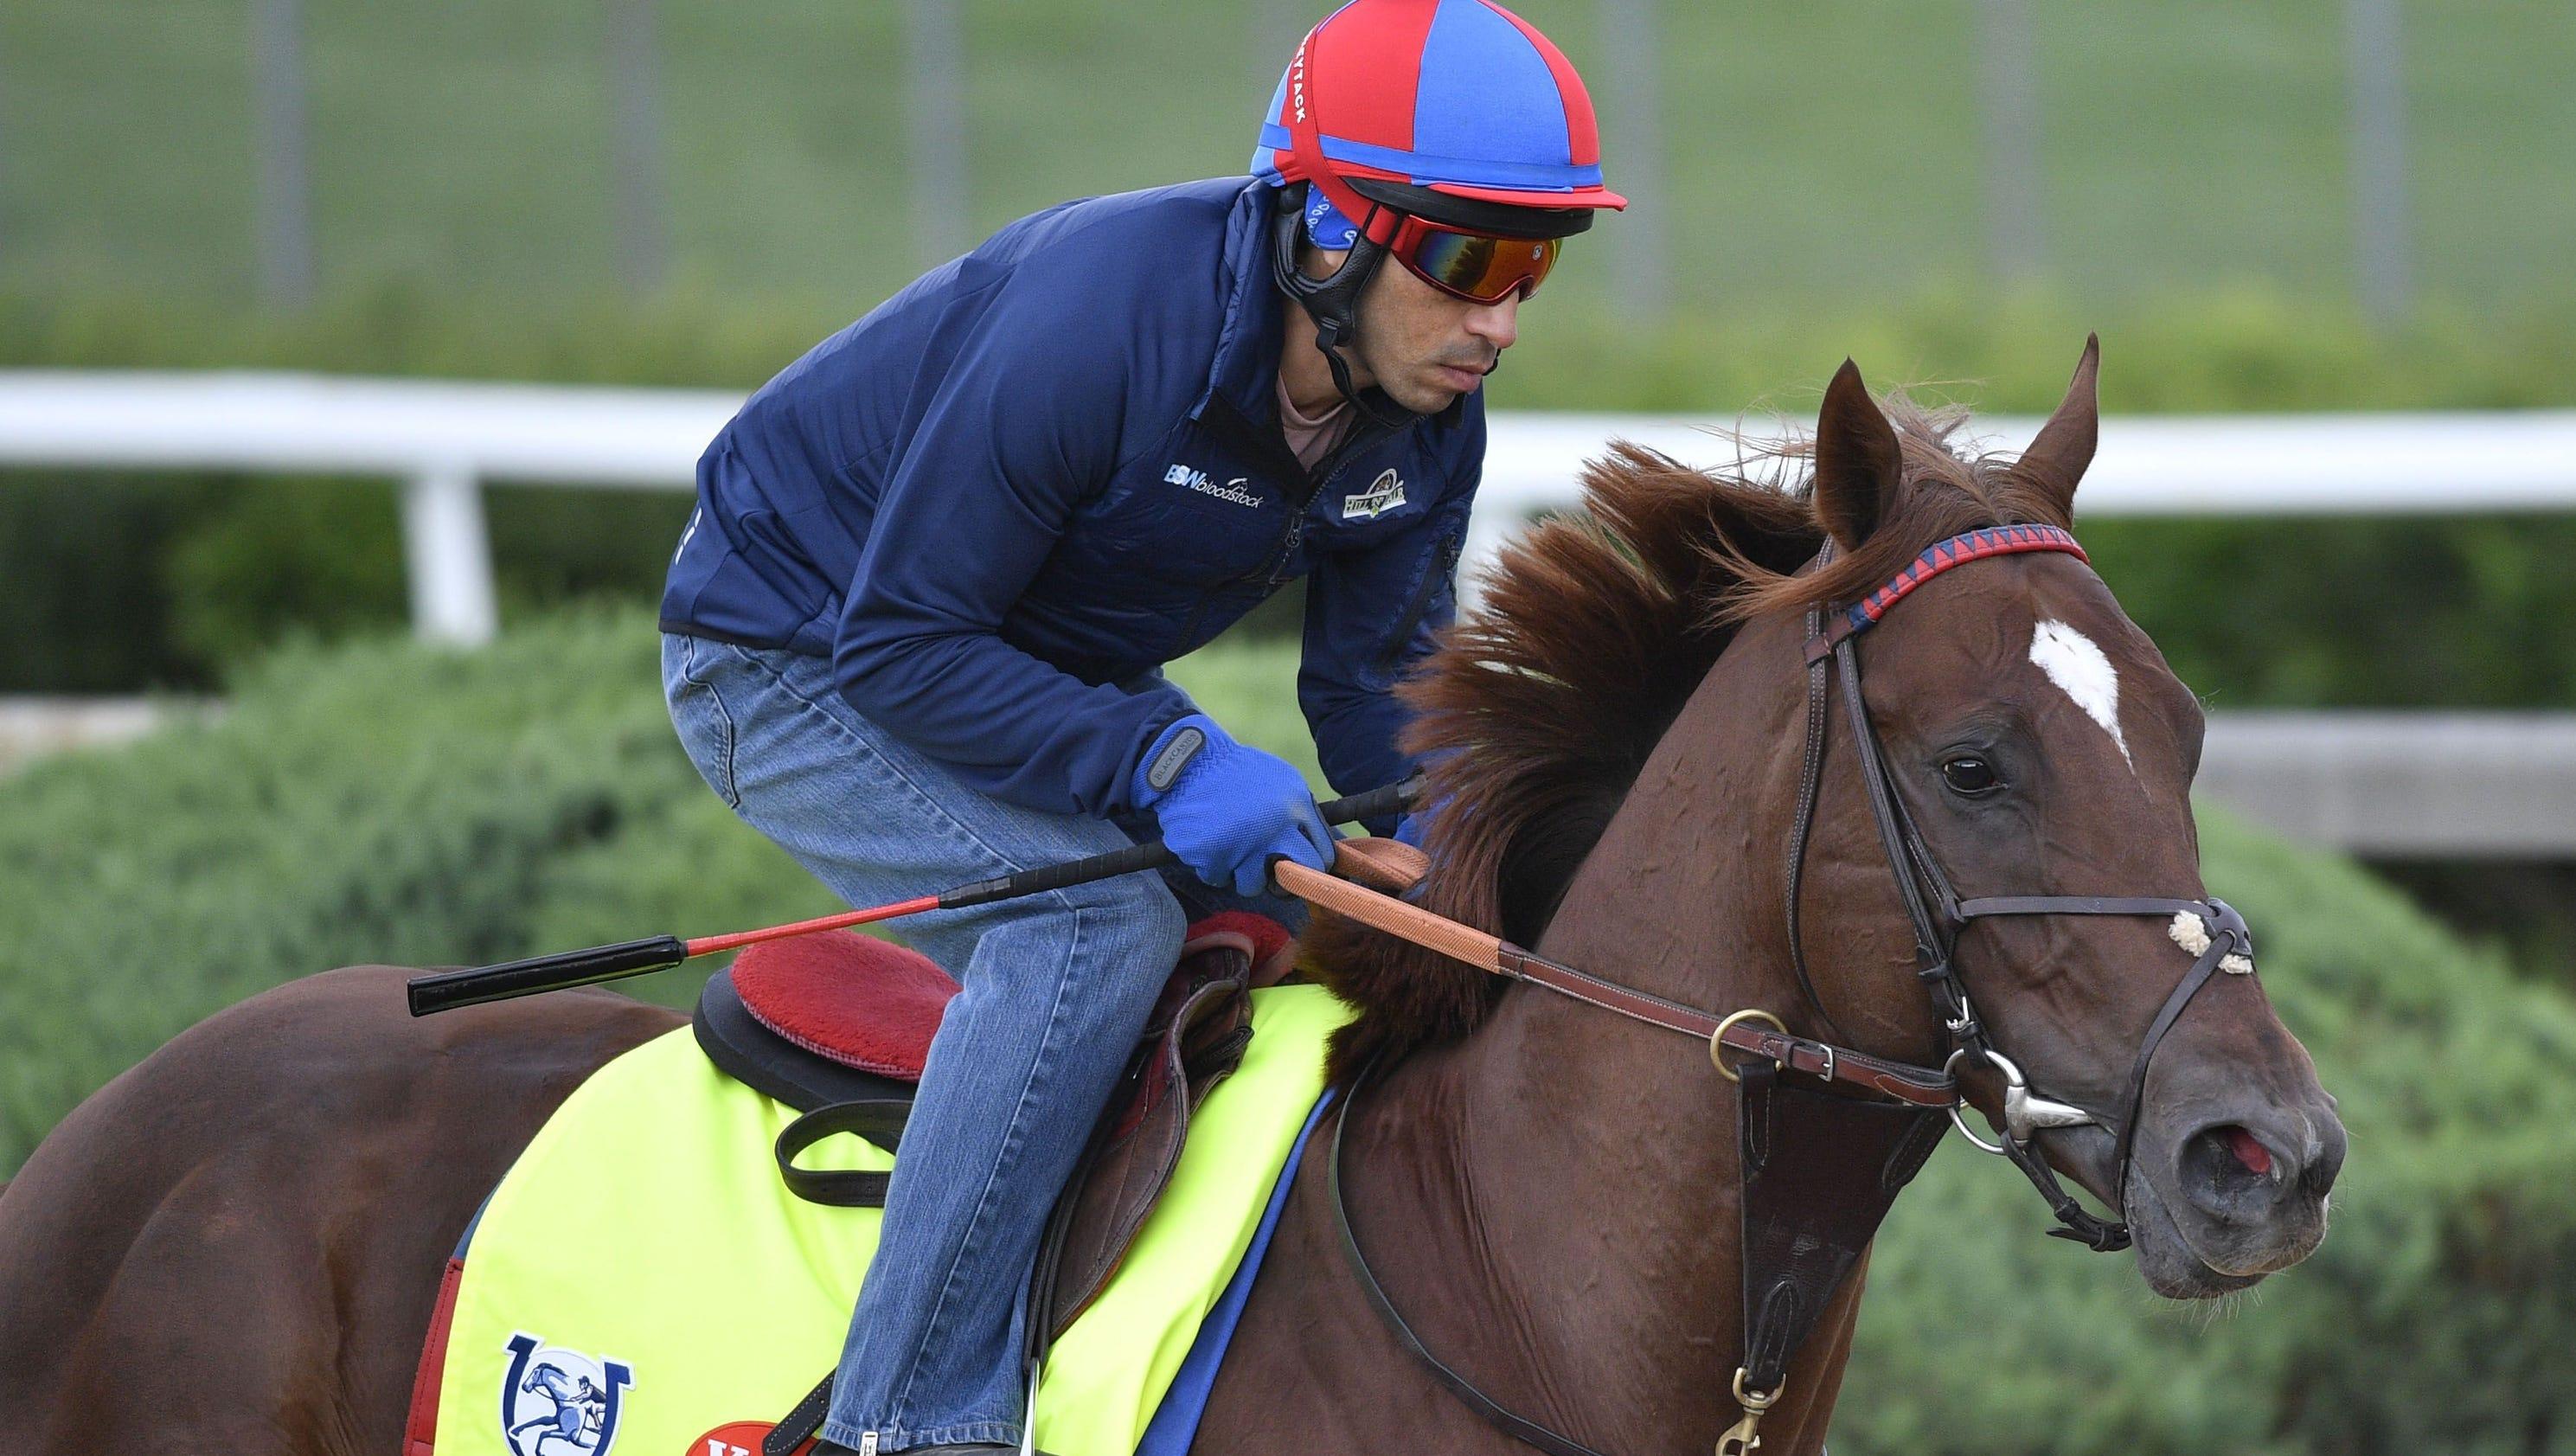 kentucky derby analysis field is muddled but race pivots